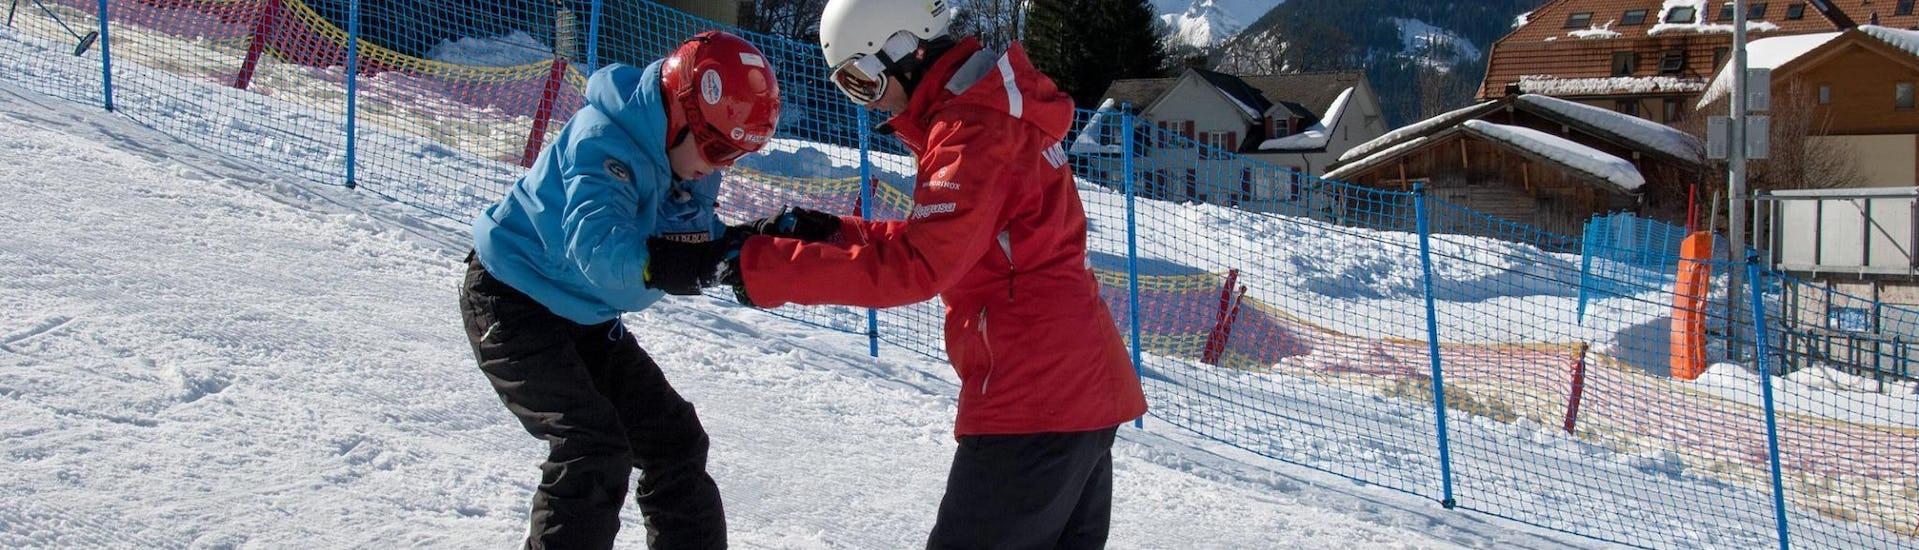 Snowboard Privatlehrer - Alle Levels & Altersgruppen